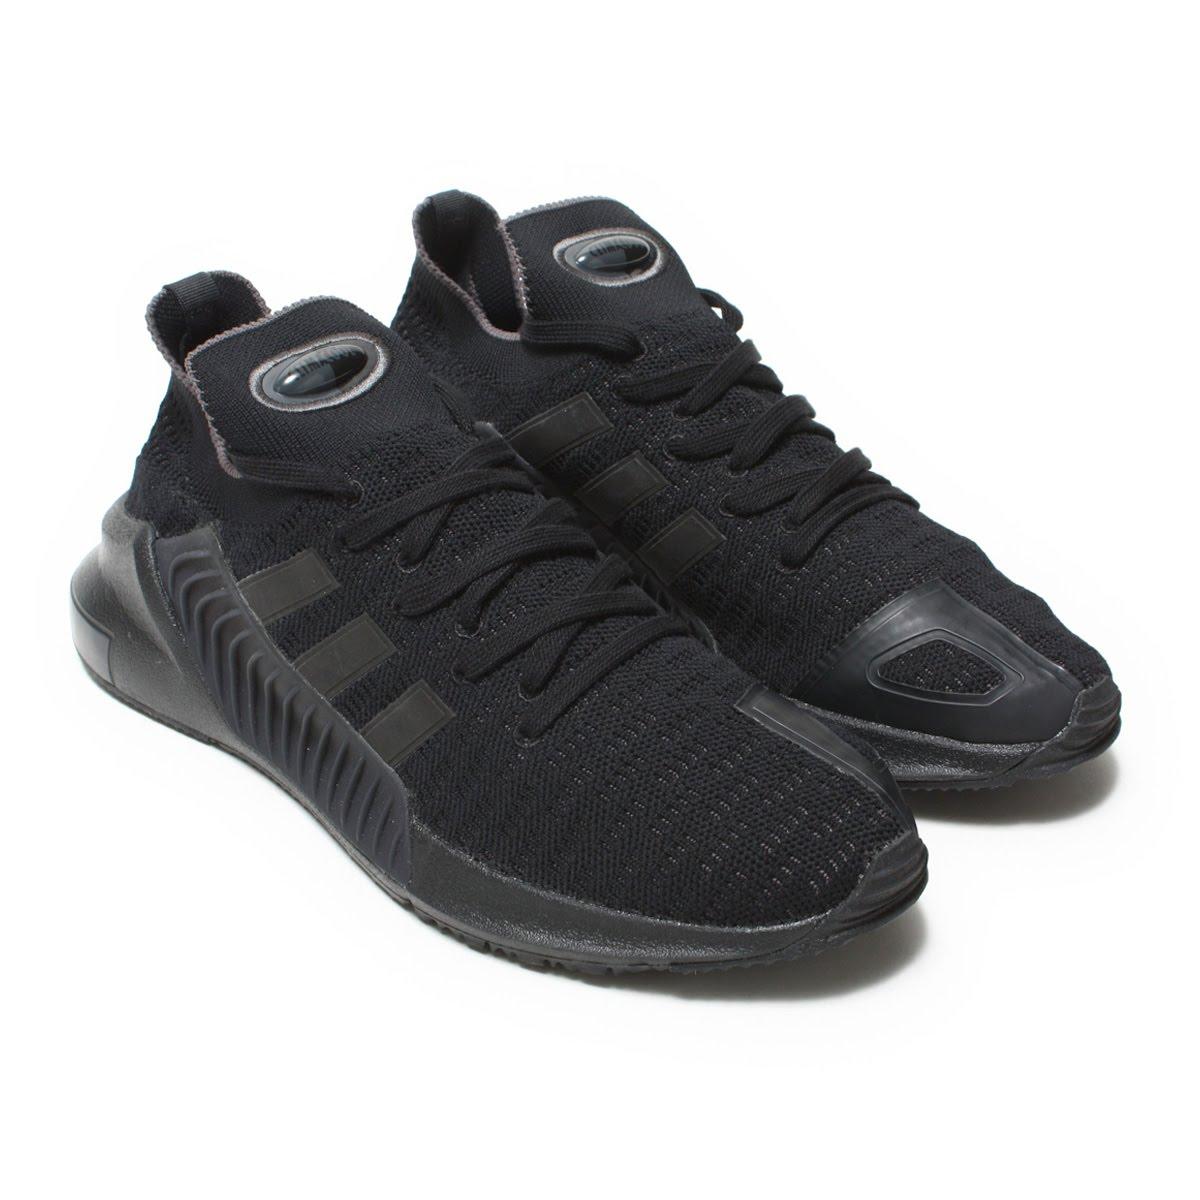 ładne buty nieźle najnowsza kolekcja adidas Originals CLIMACOOL 02/17 PK (アディダスオリジナルスクライマクール 02/17 PK)  18SS-ICore Black/Core Black/Grey 18SS-I